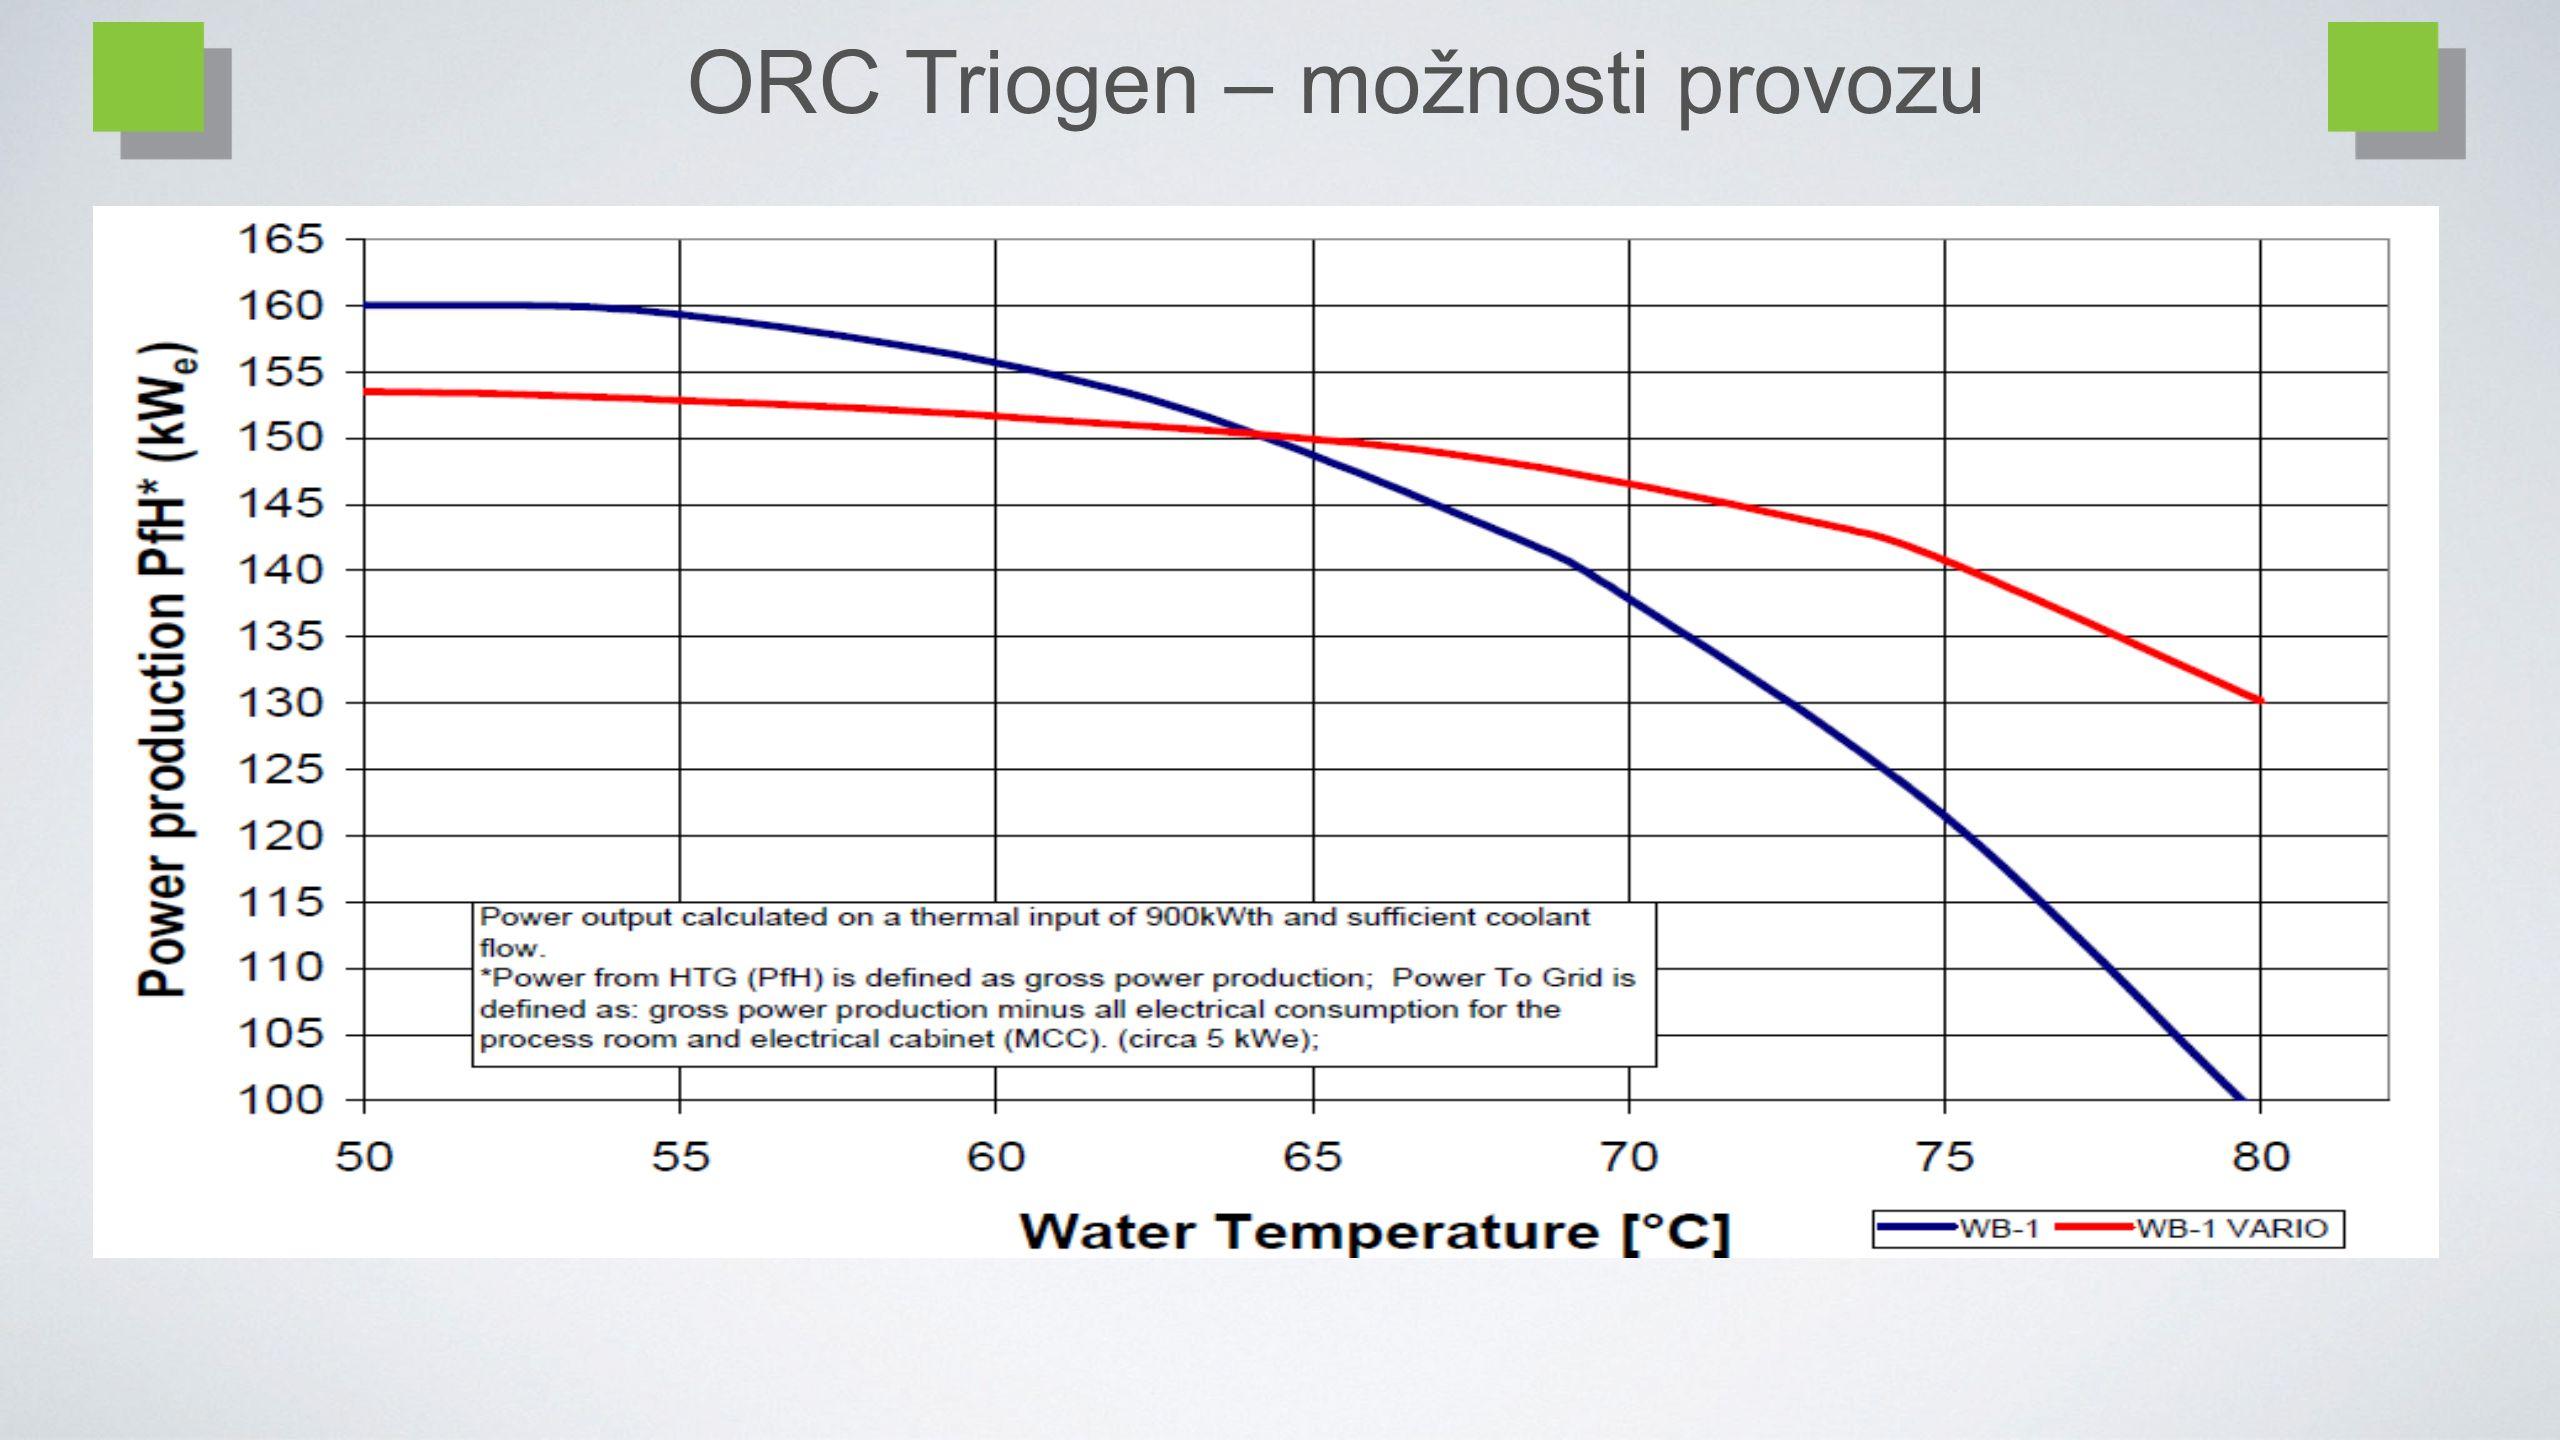 ORC Triogen – možnosti provozu